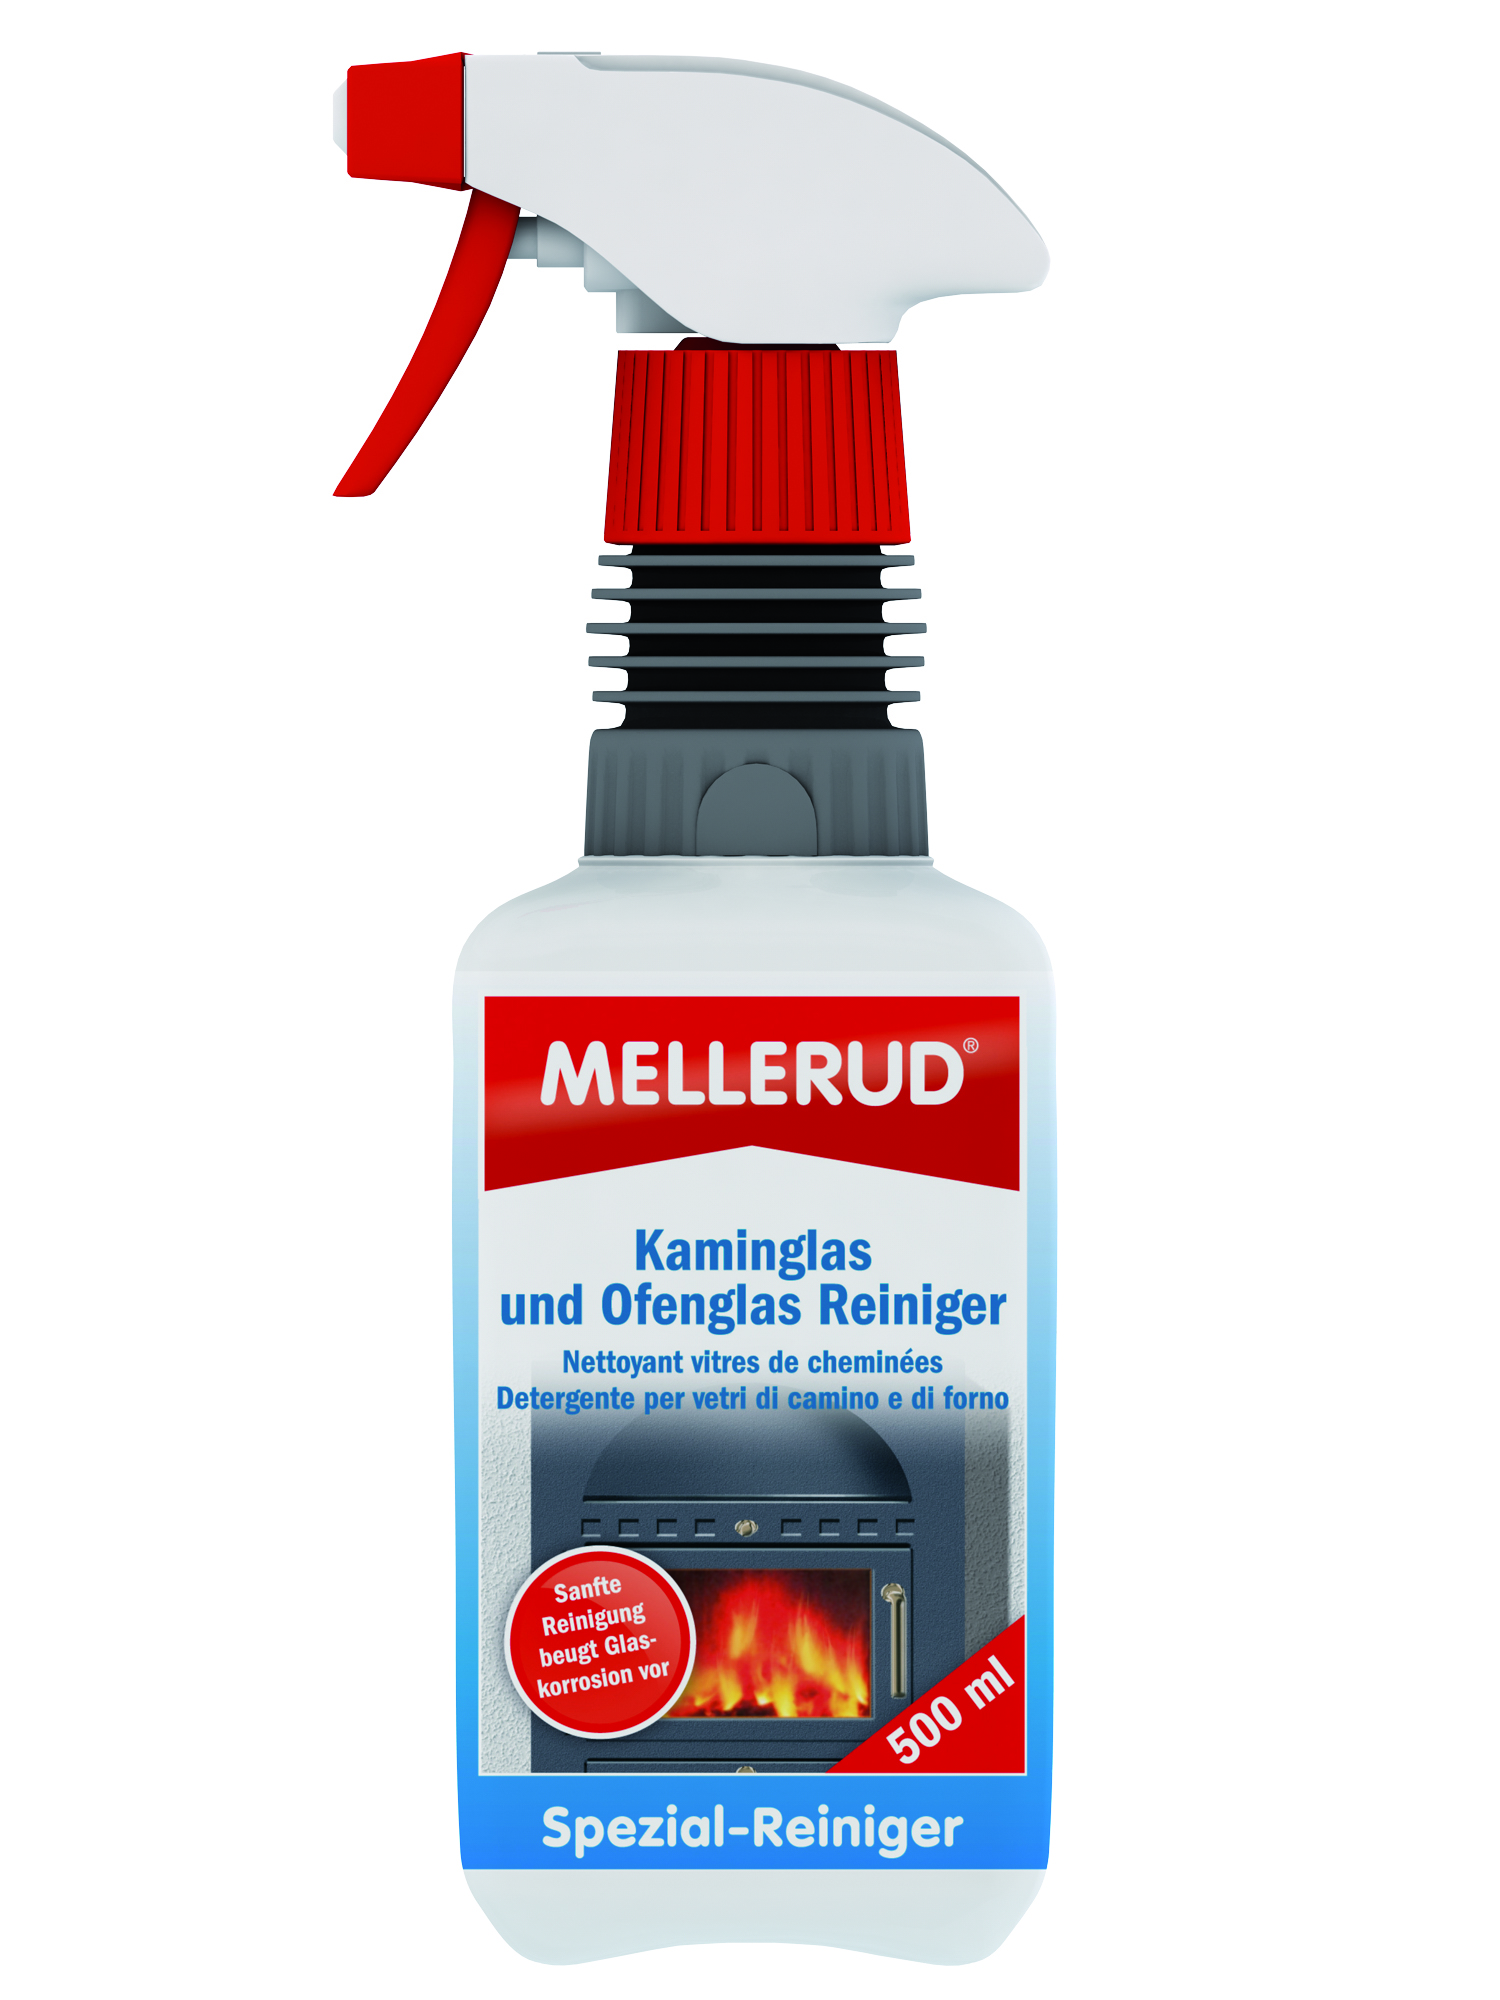 163760_Mellerud_Kaminglas und Ofenglas-Reiniger_500ml